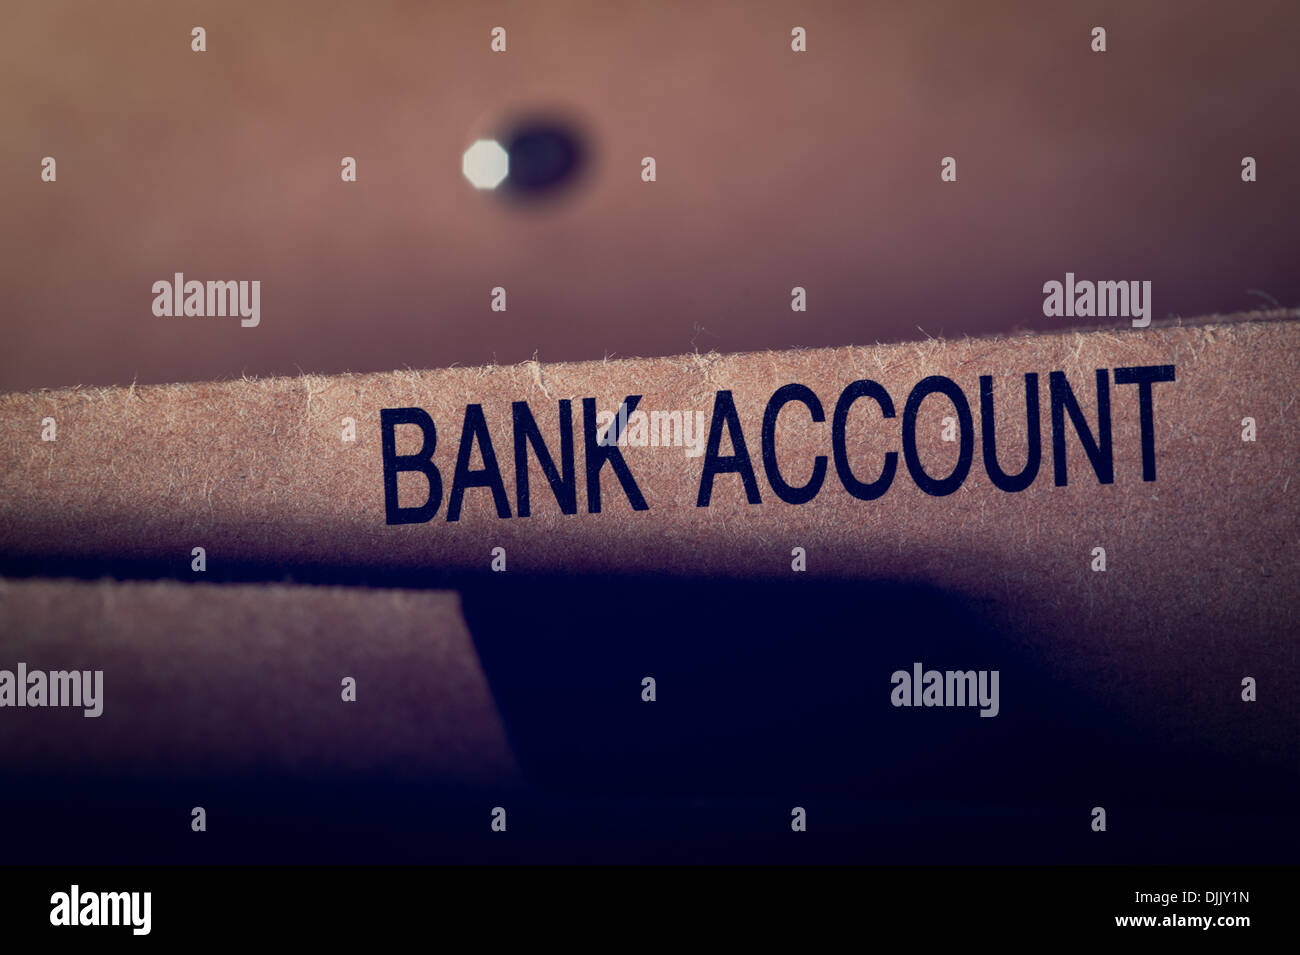 Bank Account folder - Stock Image